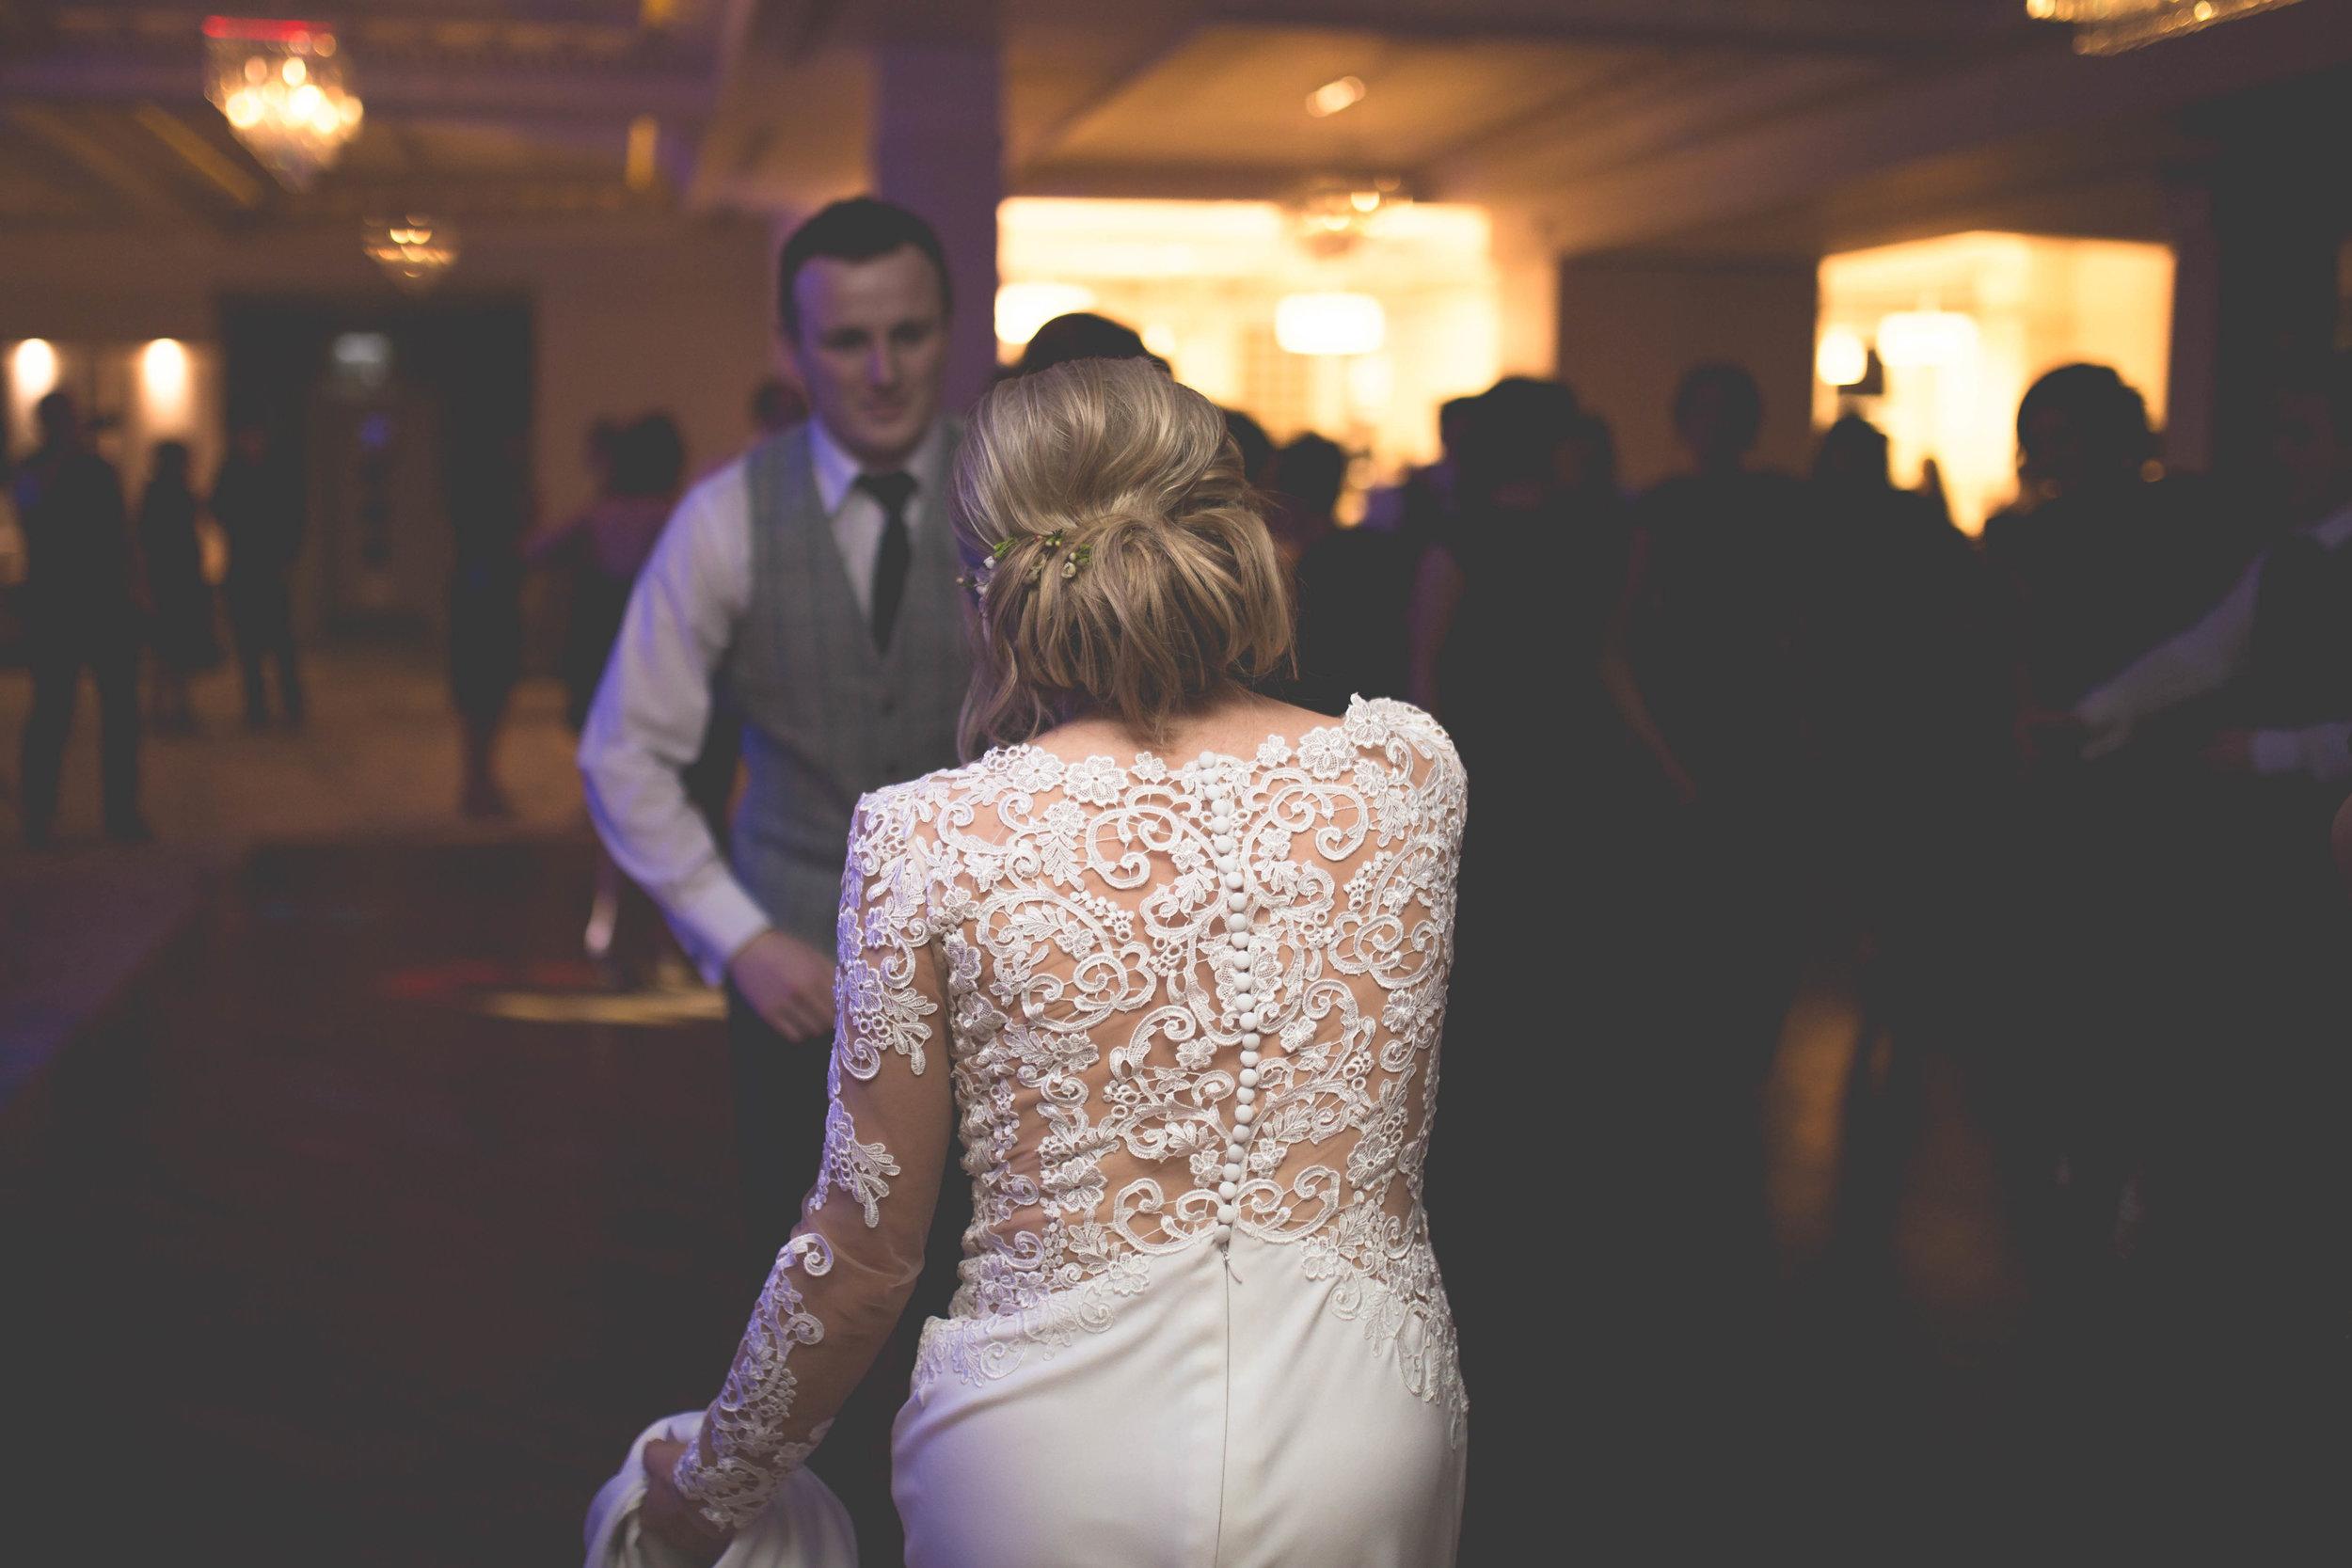 MaryJo_Conor_Mageean_Dancing-8.jpg